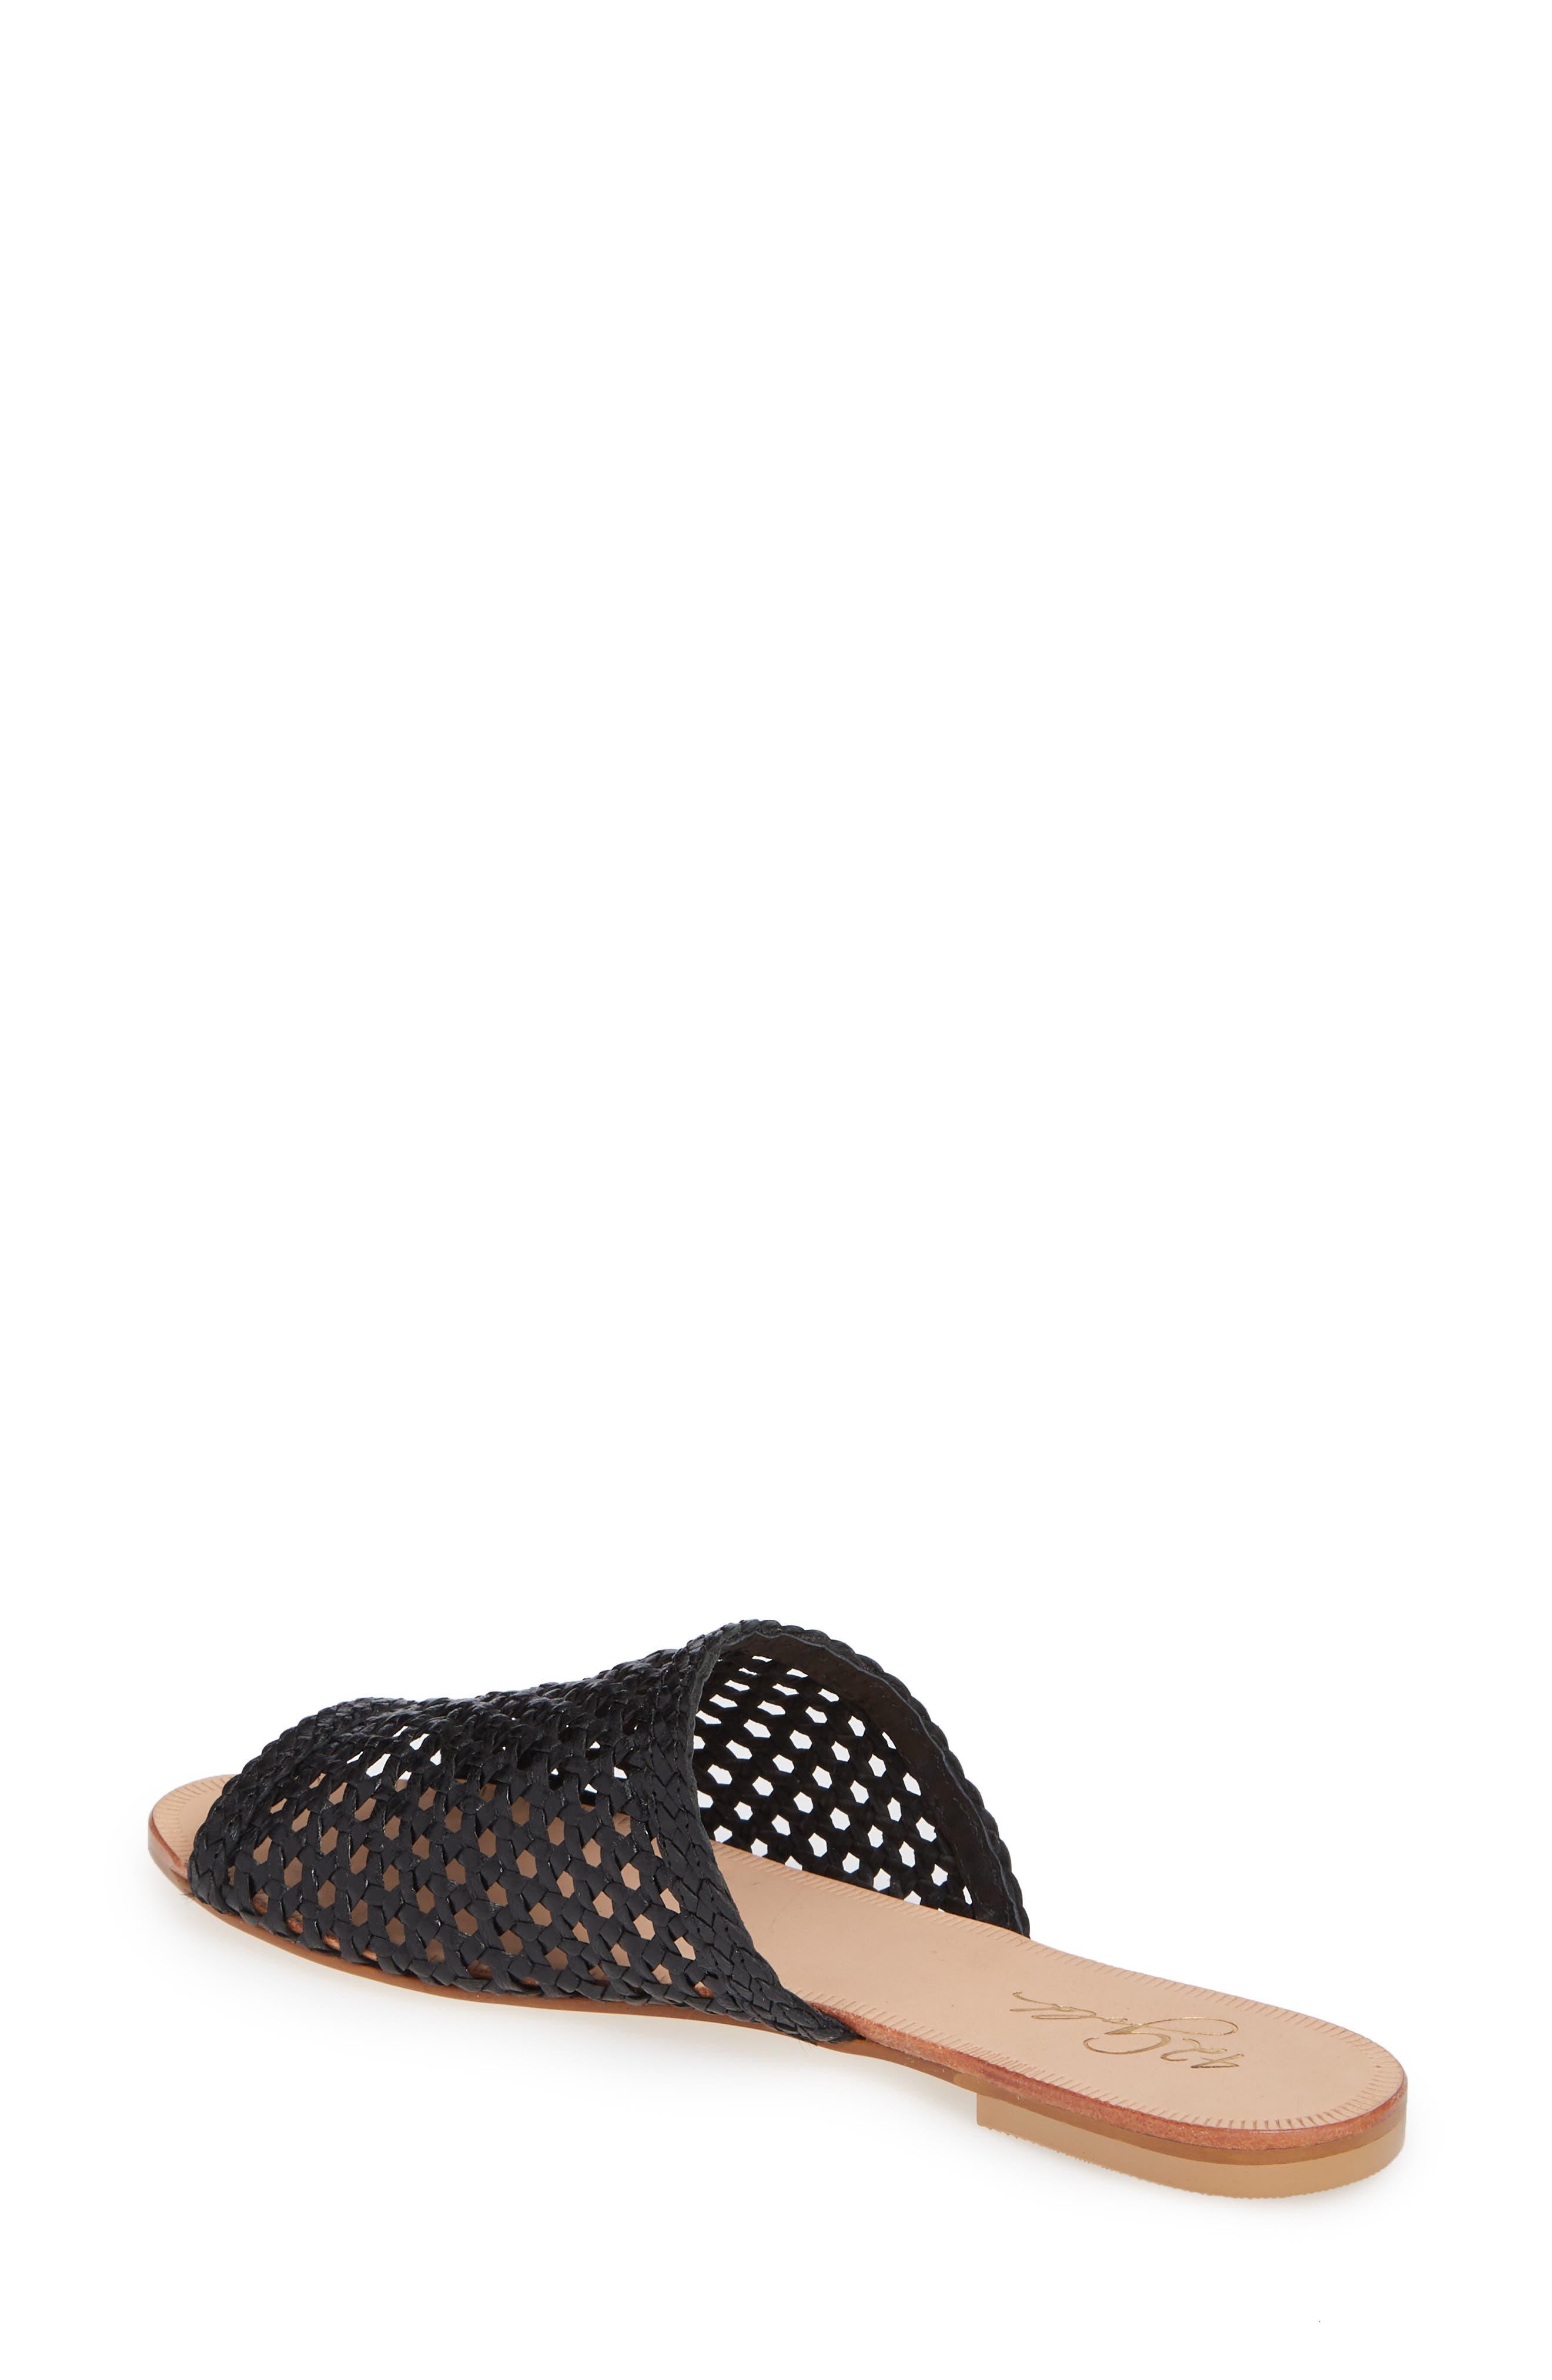 ,                             Begonia Slide Sandal (Women0,                             Alternate thumbnail 2, color,                             BLACK LEATHER